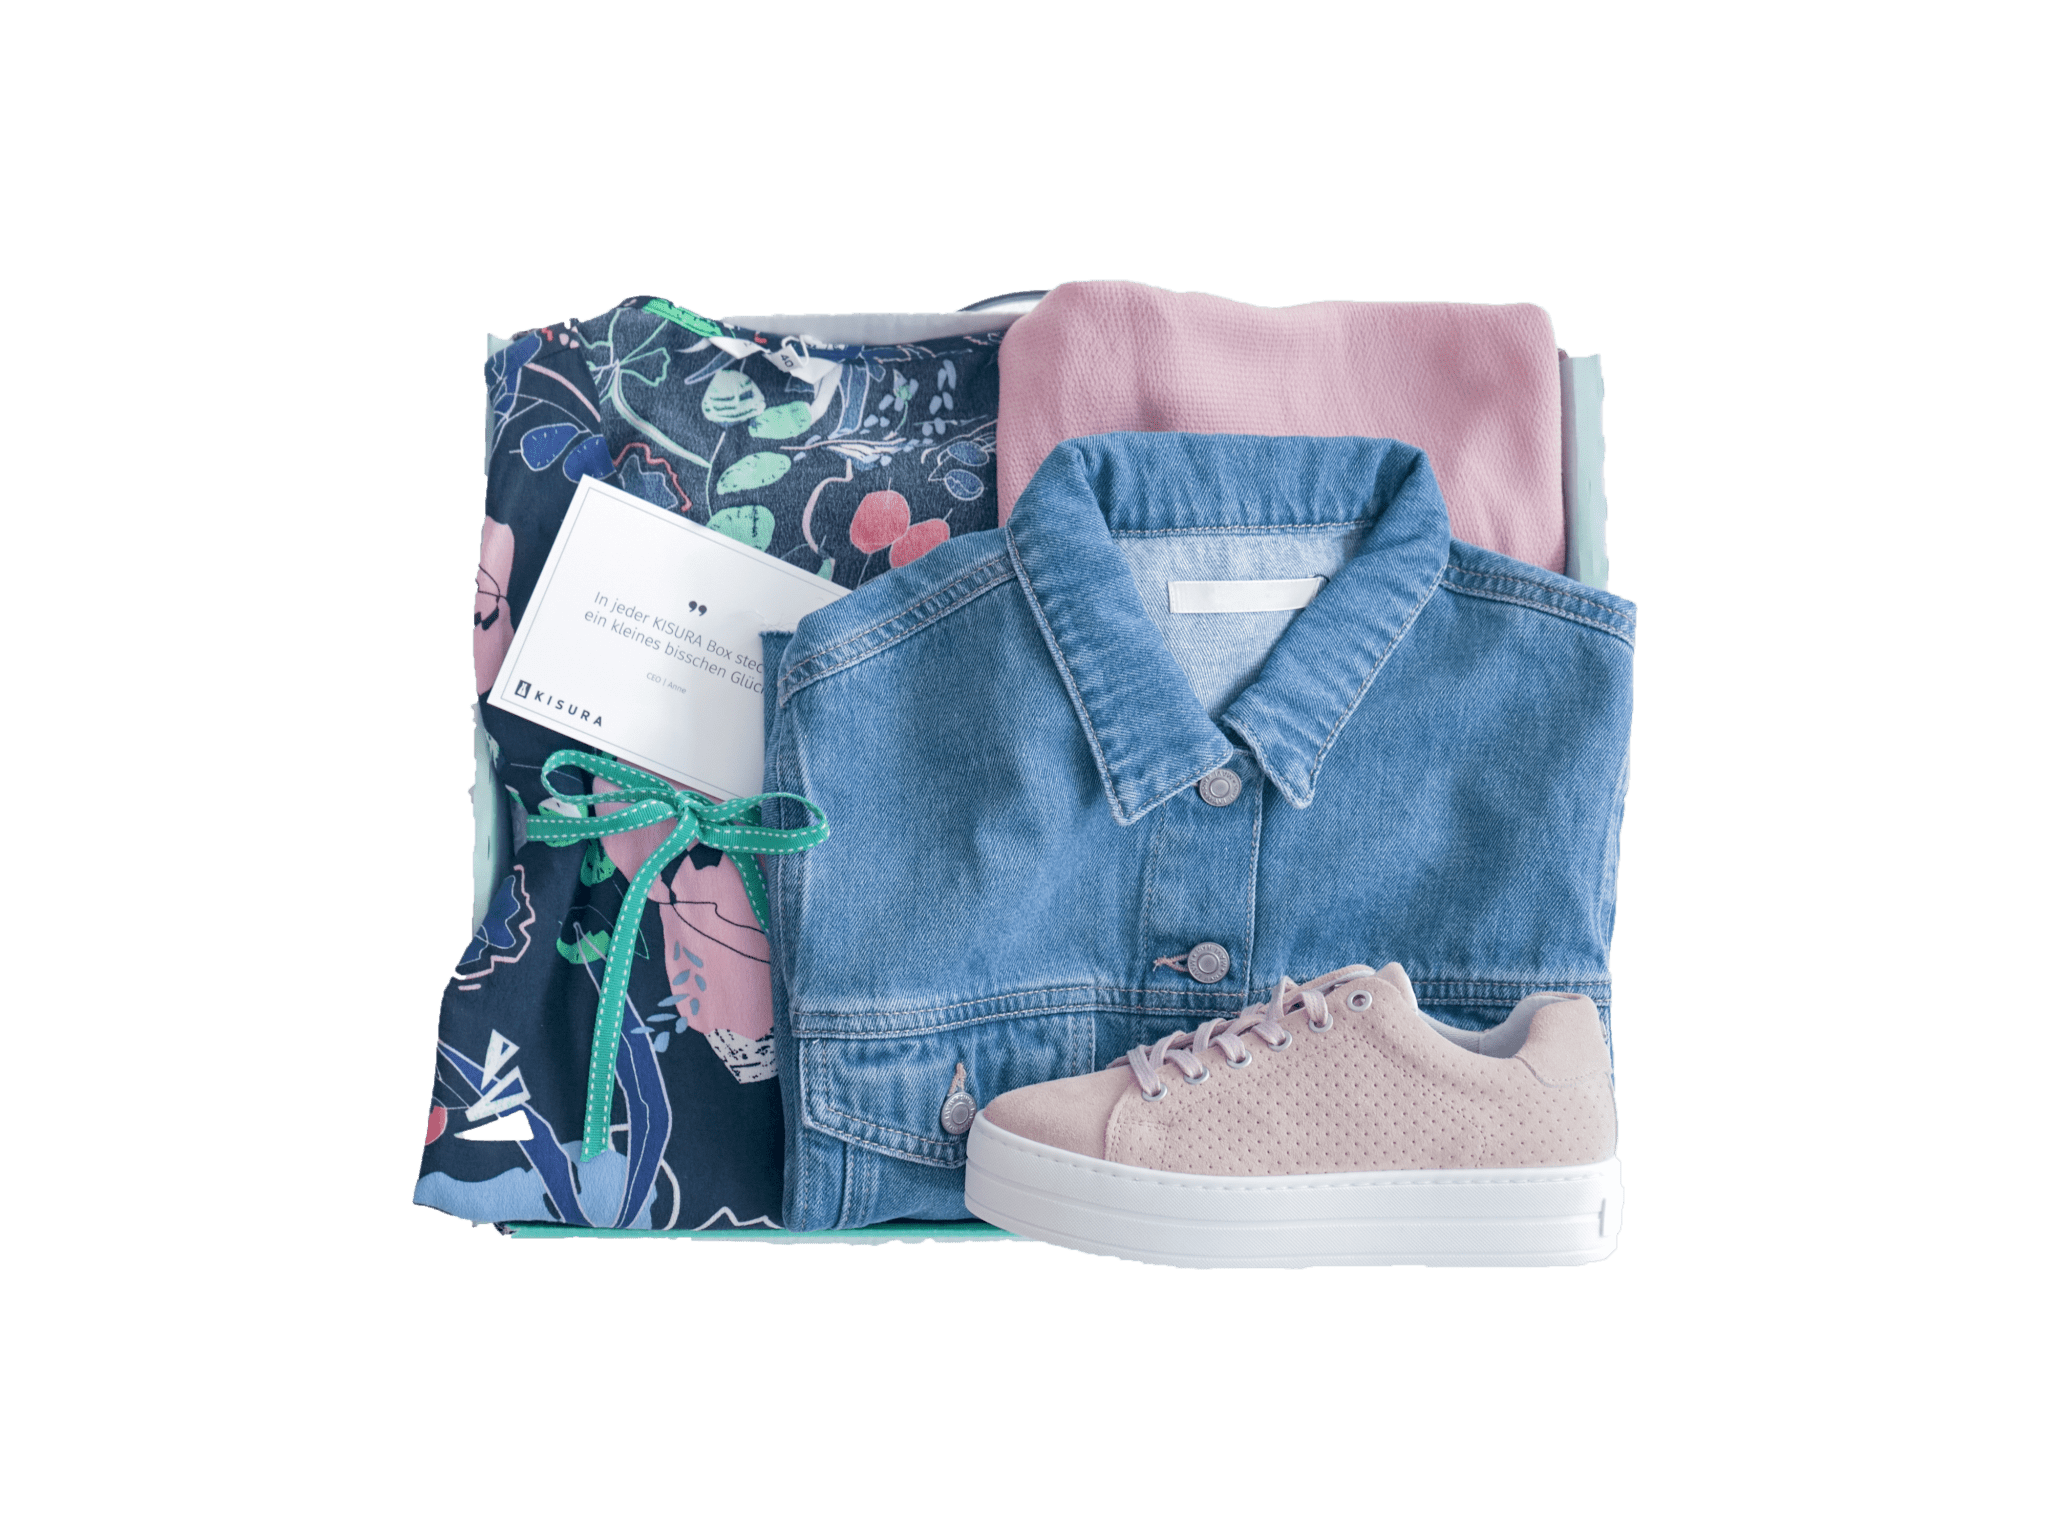 Outfitbox mit Jeansjacke, rosa Sneakern und Blumenbluse